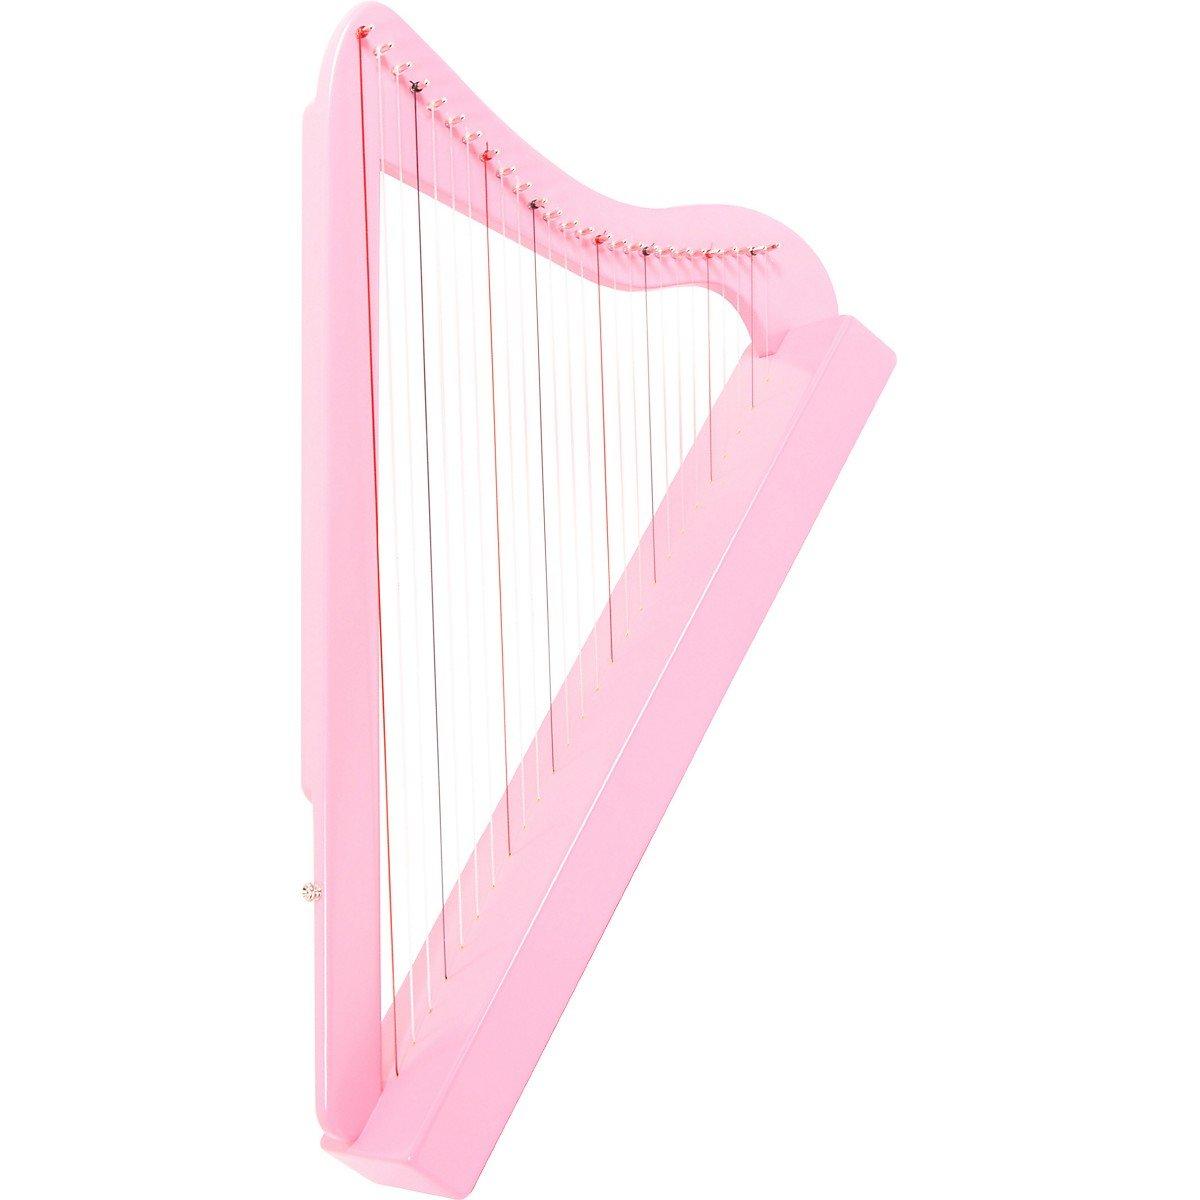 Rees Harps Harpsicle Harp Harp1000black